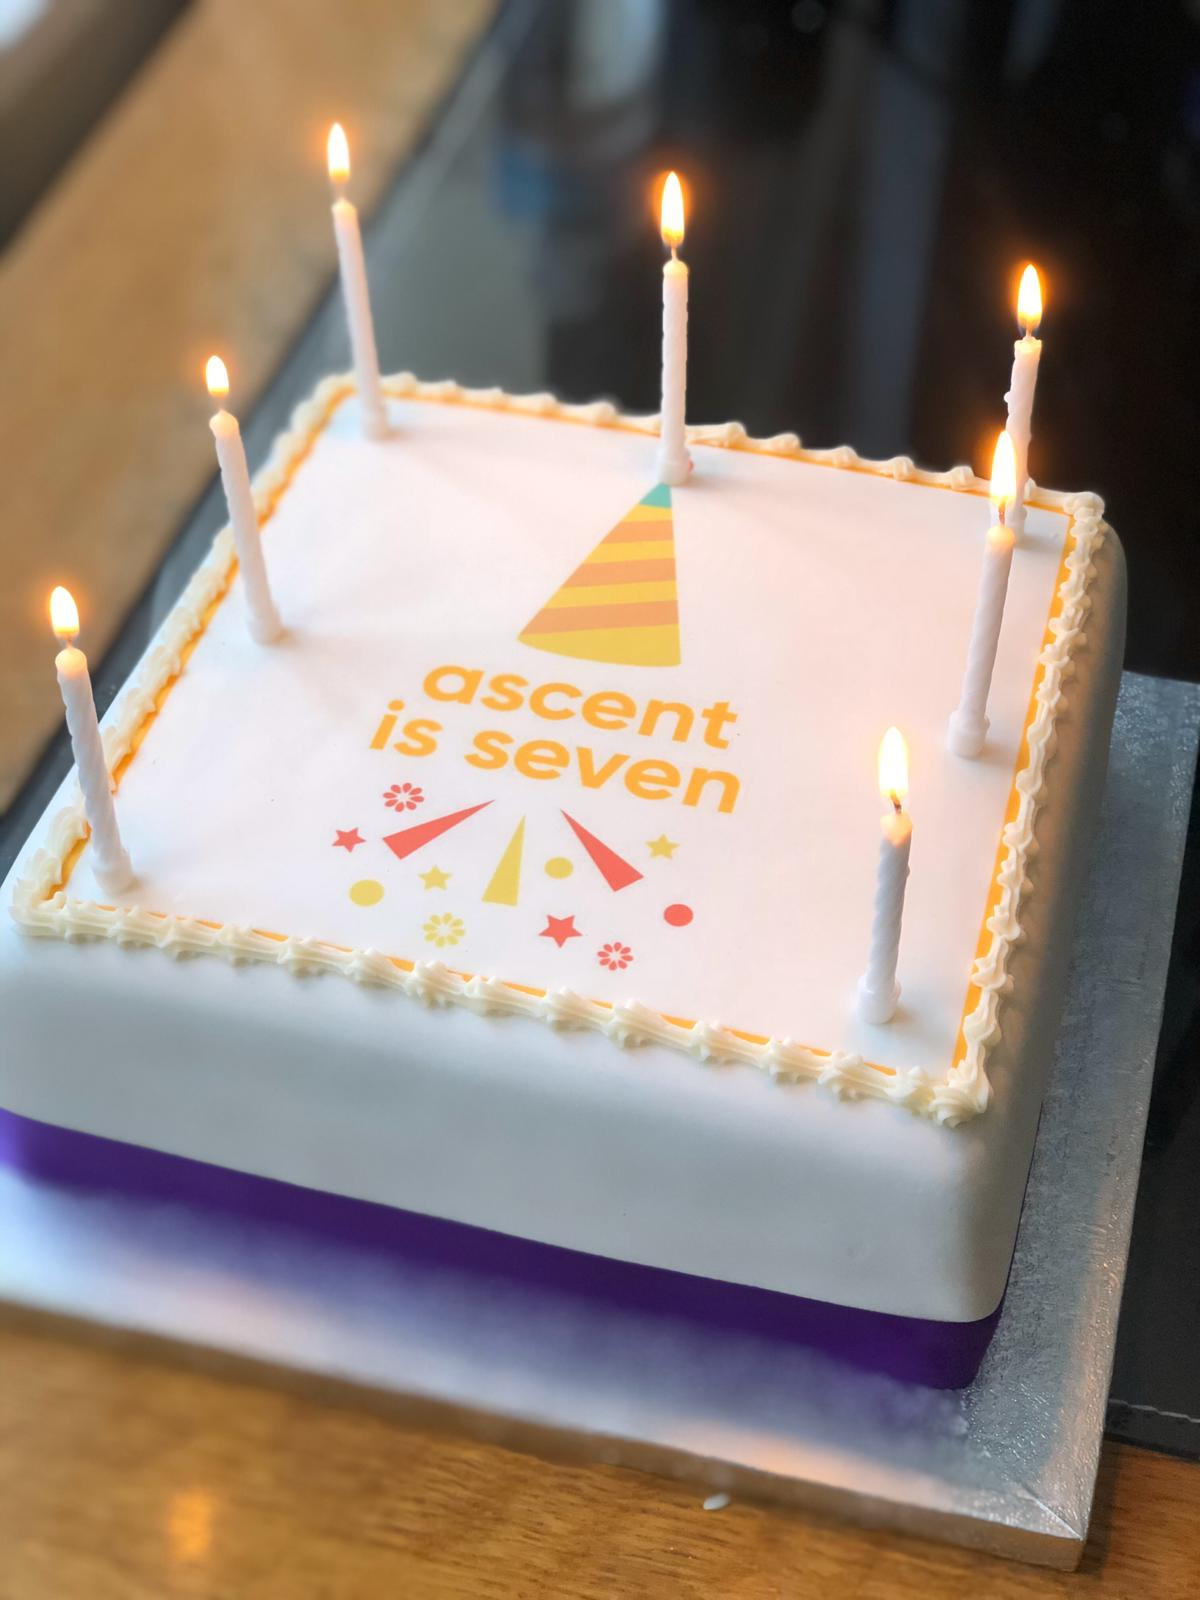 Ascent 7th Birthday